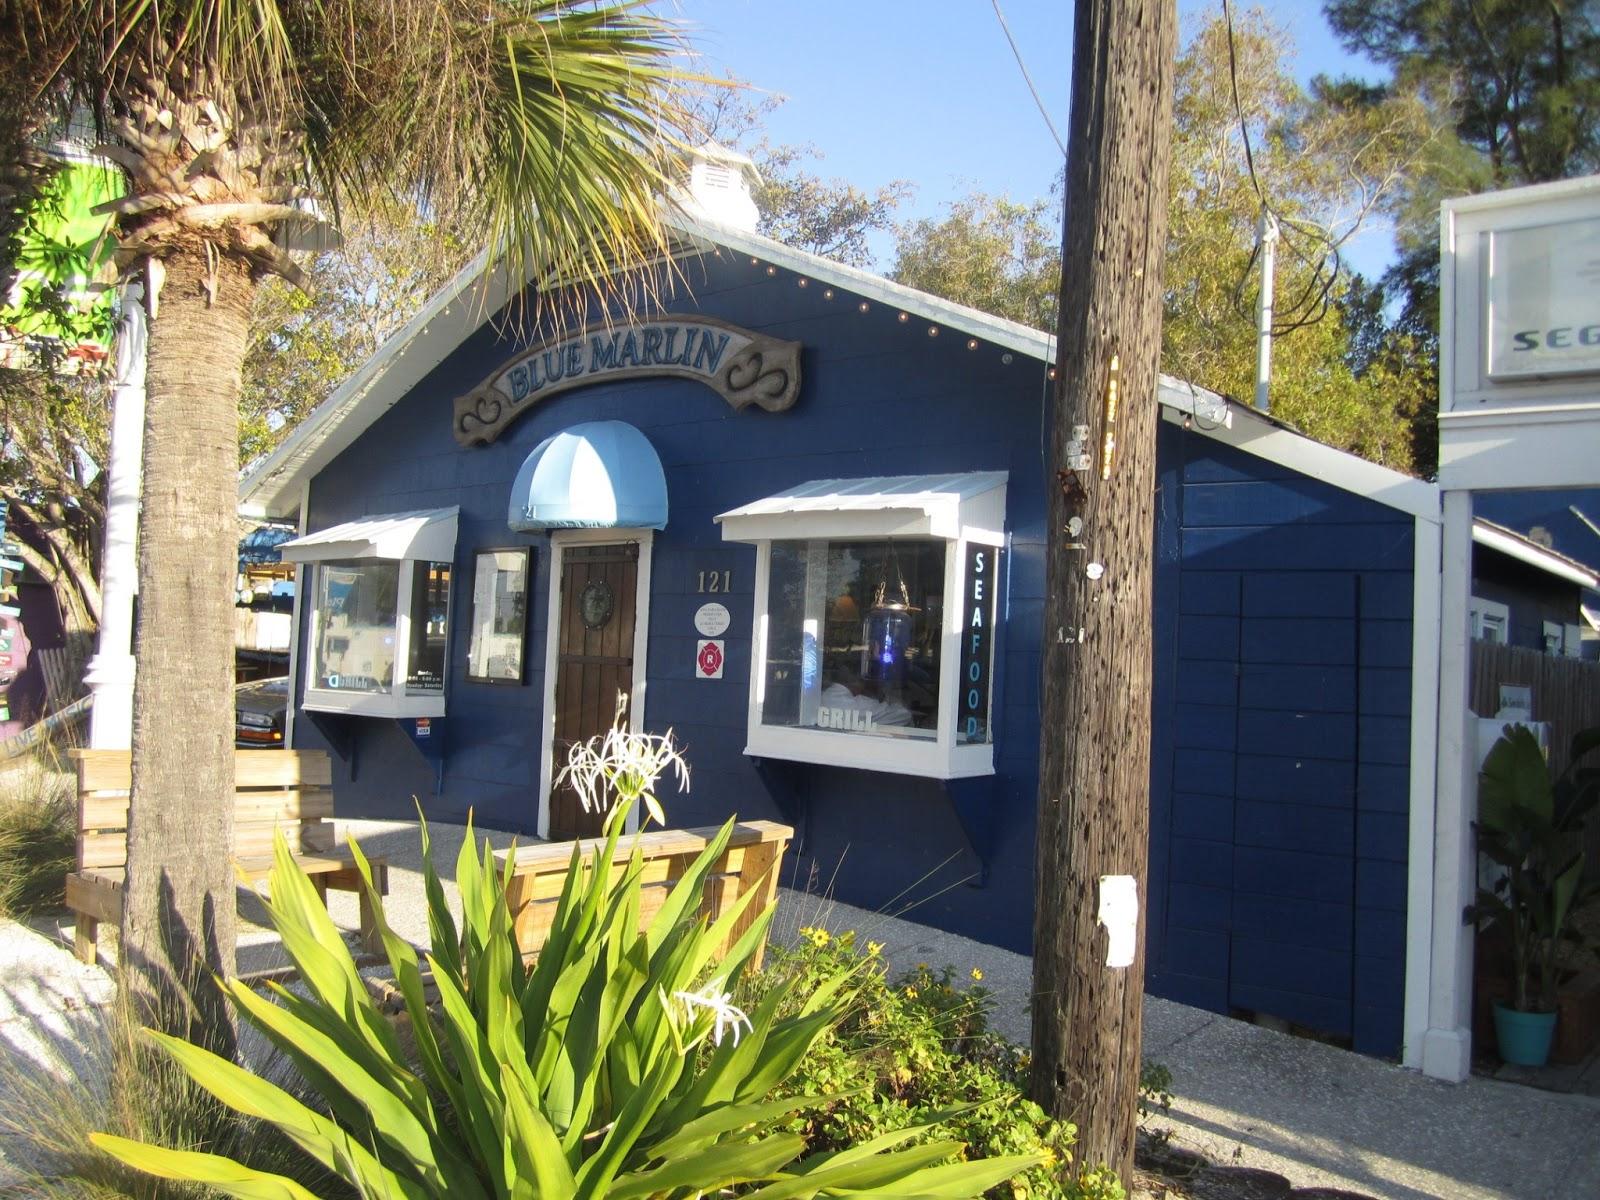 Epicurean Perils Of Sweet Polly Blue Marlin Restaurant